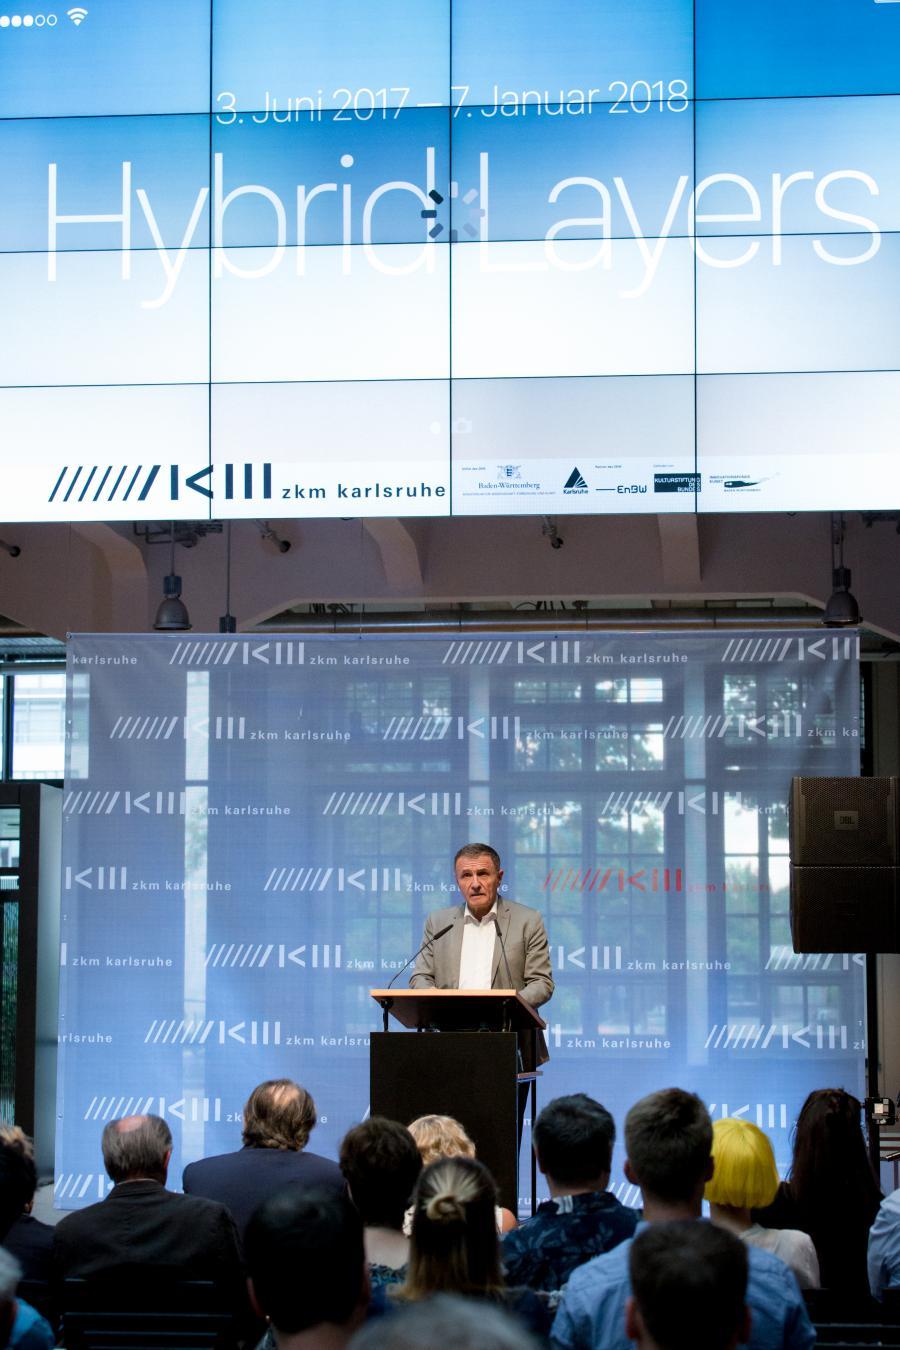 Wolfram Jäger, Mayor of the city of Karlsruhe, speaks at the opening